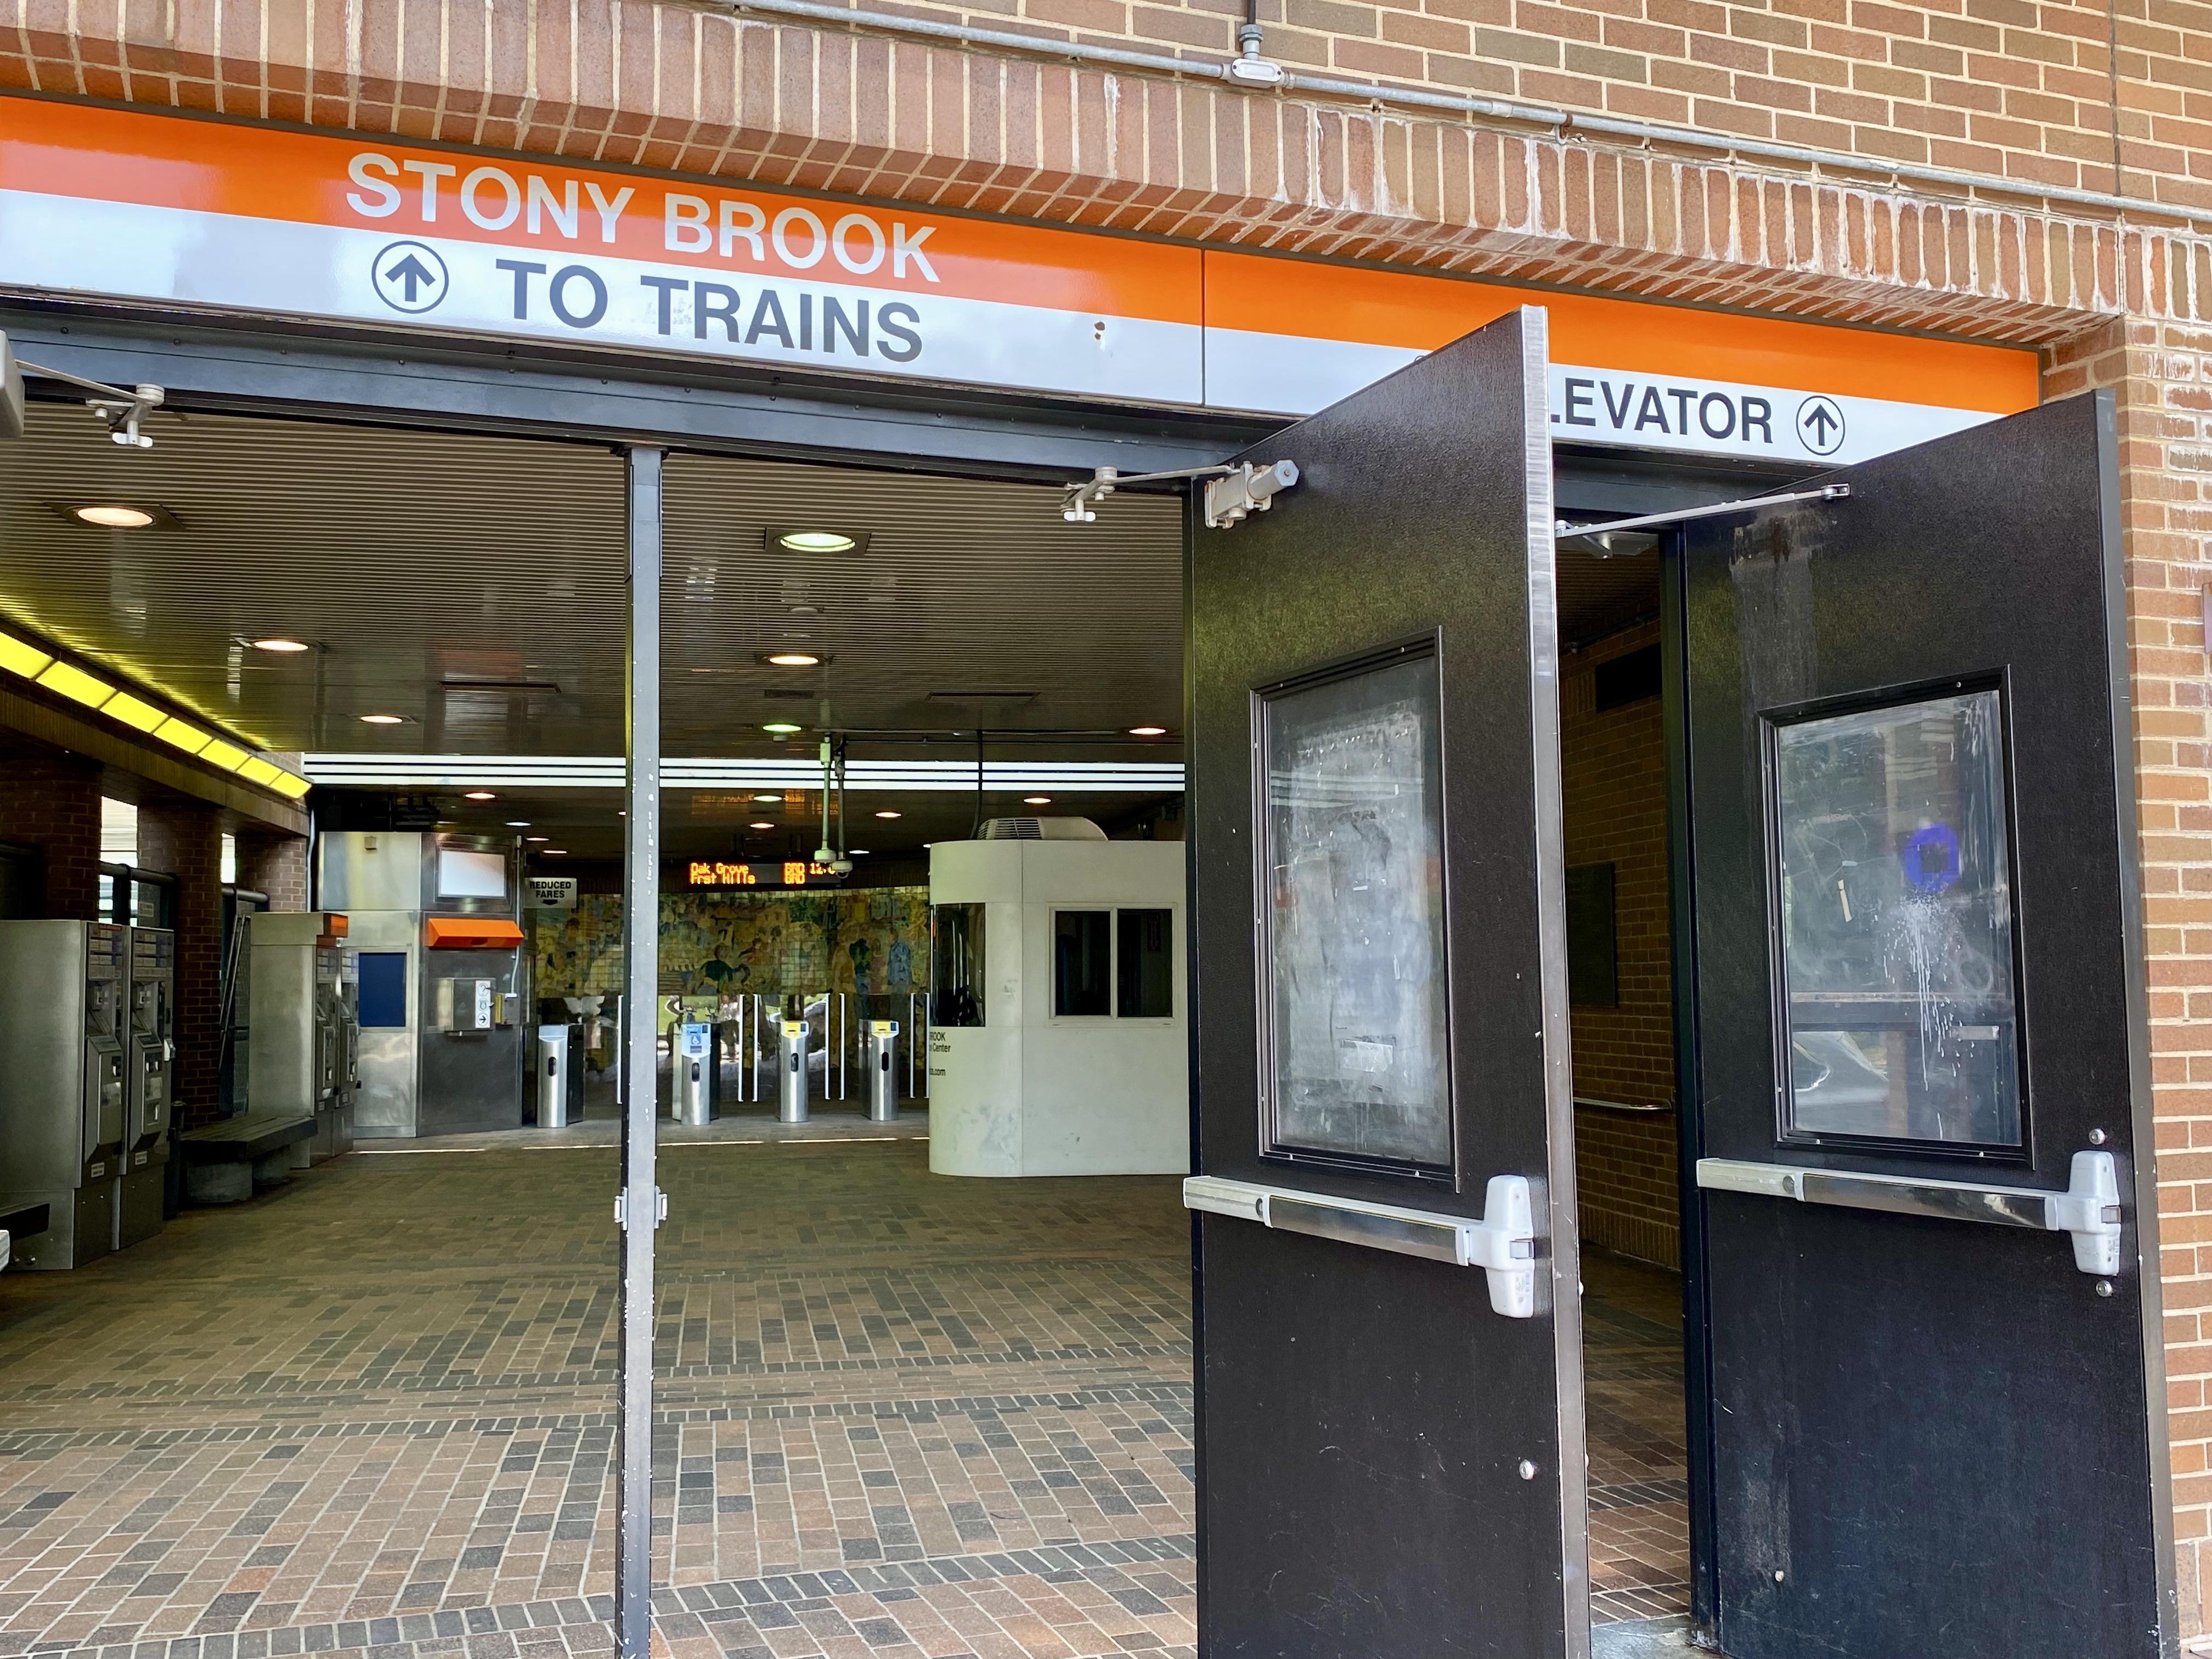 Stony Brook Orange Line Station in Jamaica Plain